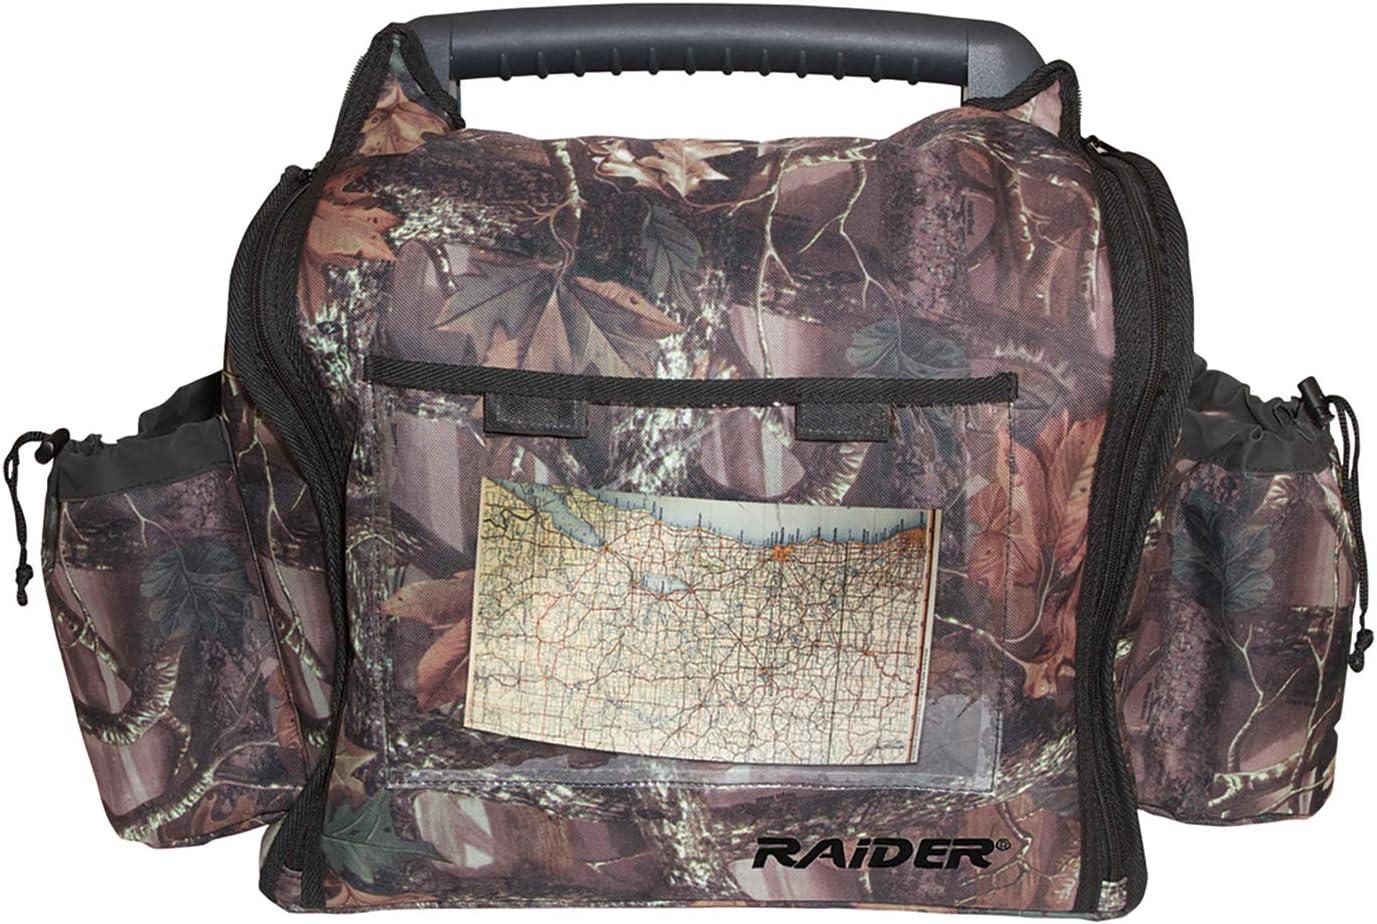 Raider BCS-26 Black Portable Heater Storage Case Fits Mr. Heater Model: MH18b